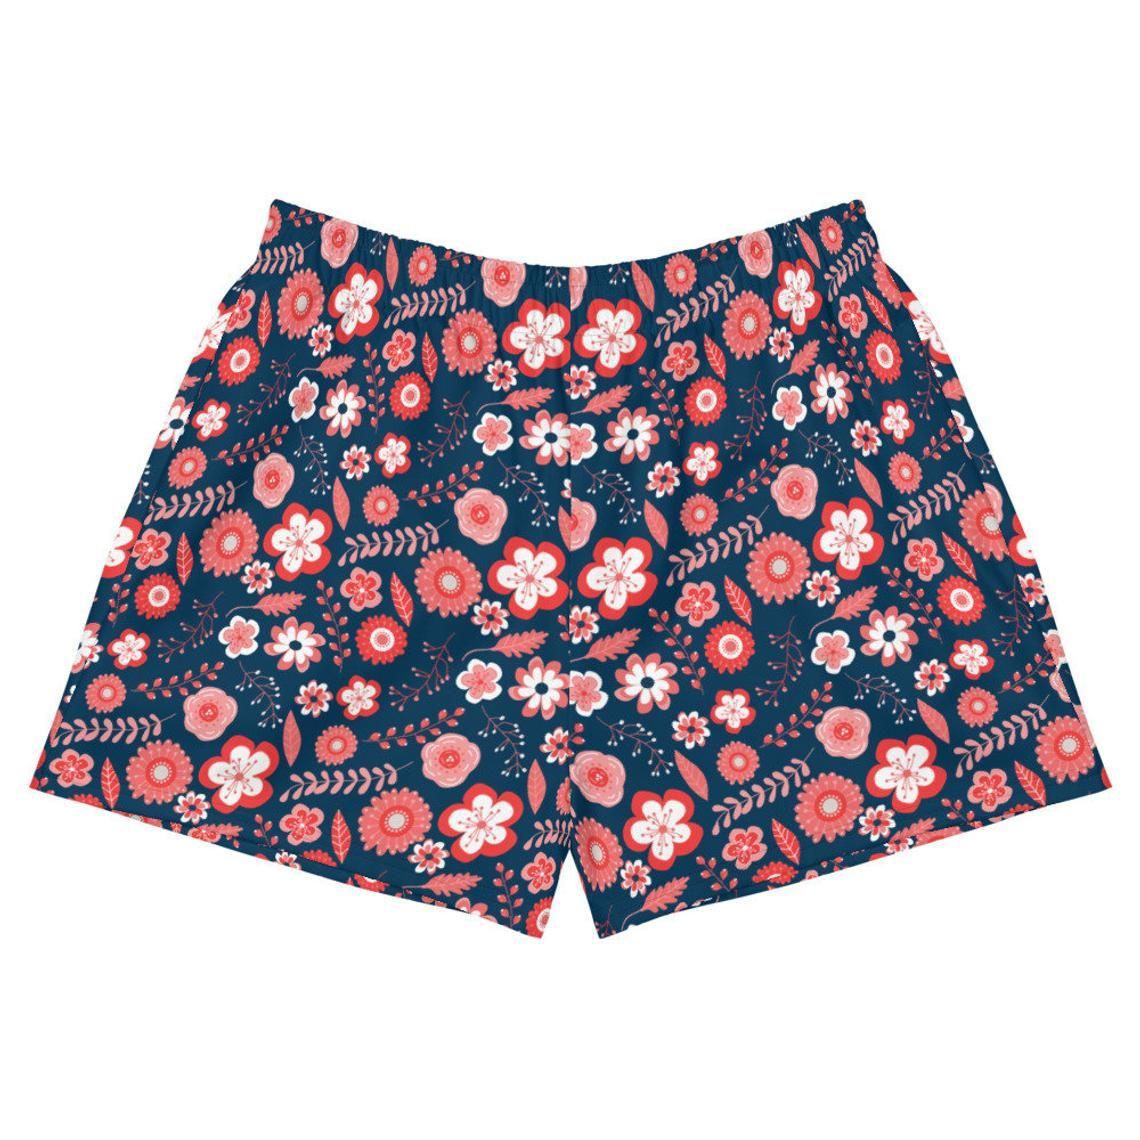 Womens athletic floral shorts as running shorts Dark blue   Etsy